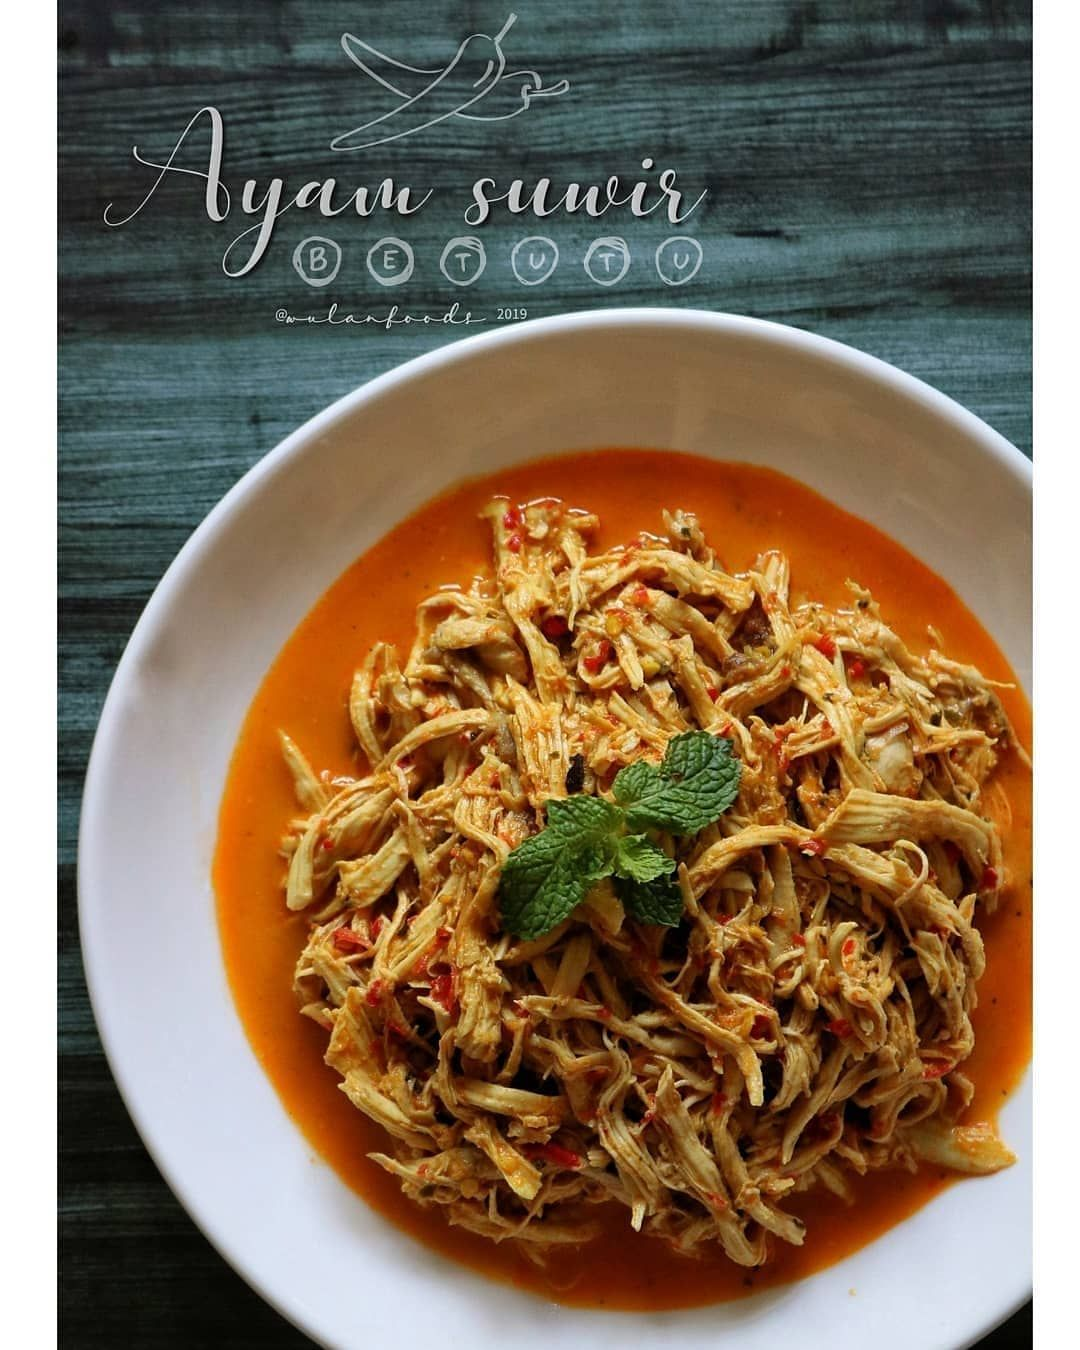 Doyan Cooking Di Instagram Resep Ayam Suwir Betutu By Wulanfoods Bahan 1 Dada Ayam Cuci Bersih Rebus Sampe Empu Resep Ayam Suwir Resep Ayam Dada Ayam